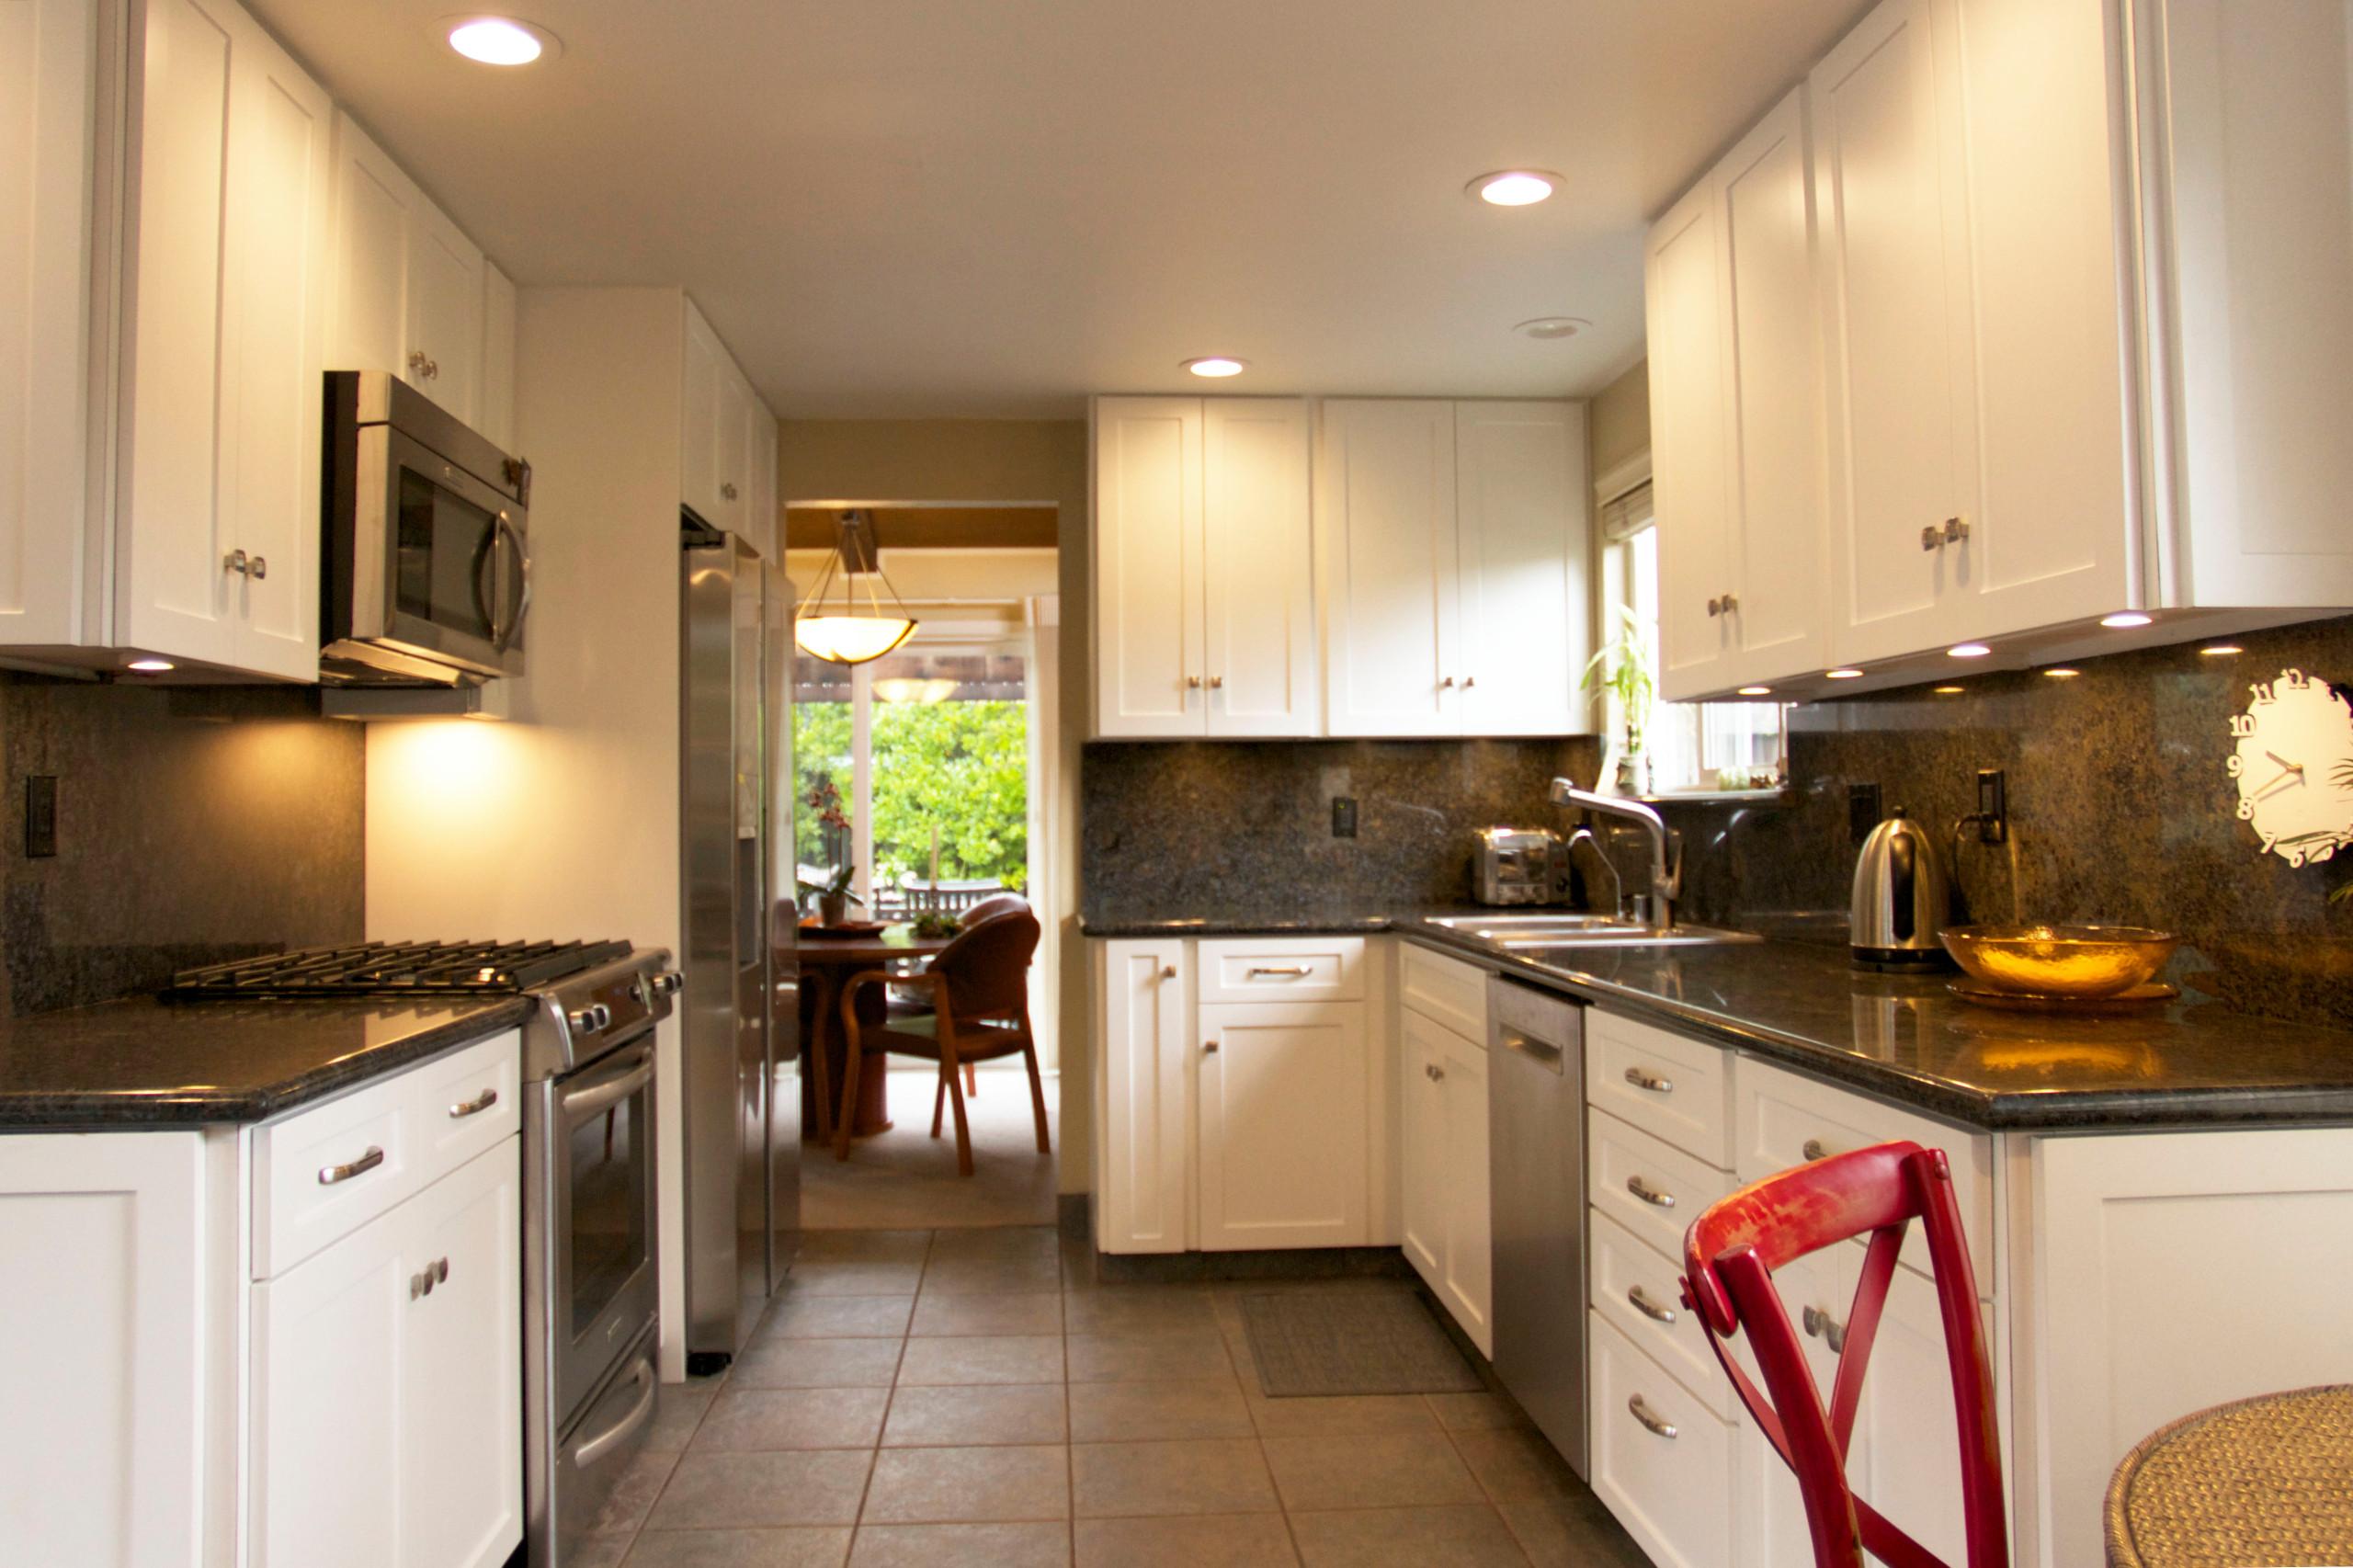 Ignacio Kitchen Reface and Bathroom Update